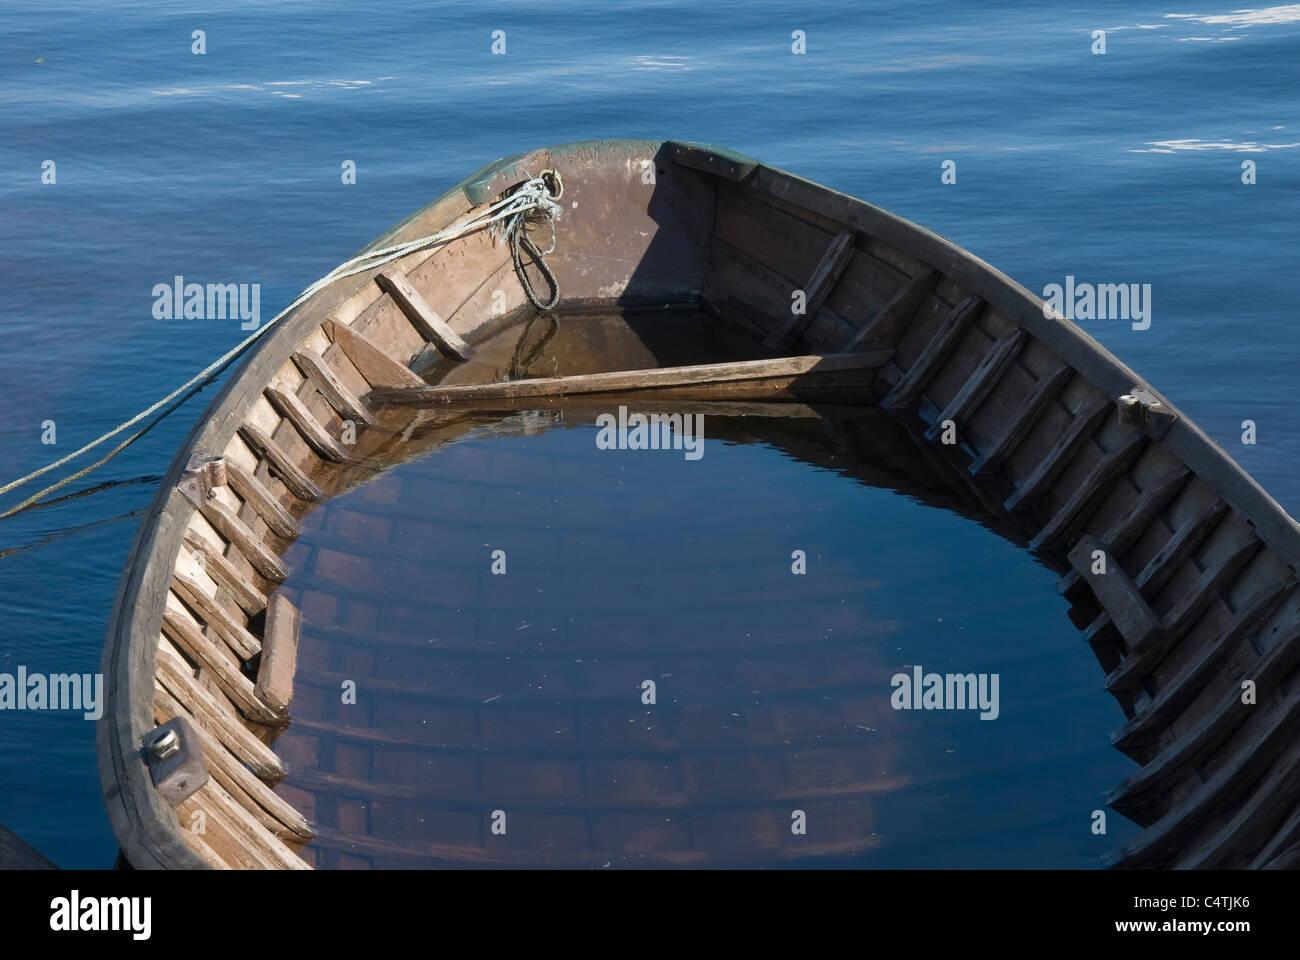 Barco en remojo Imagen De Stock